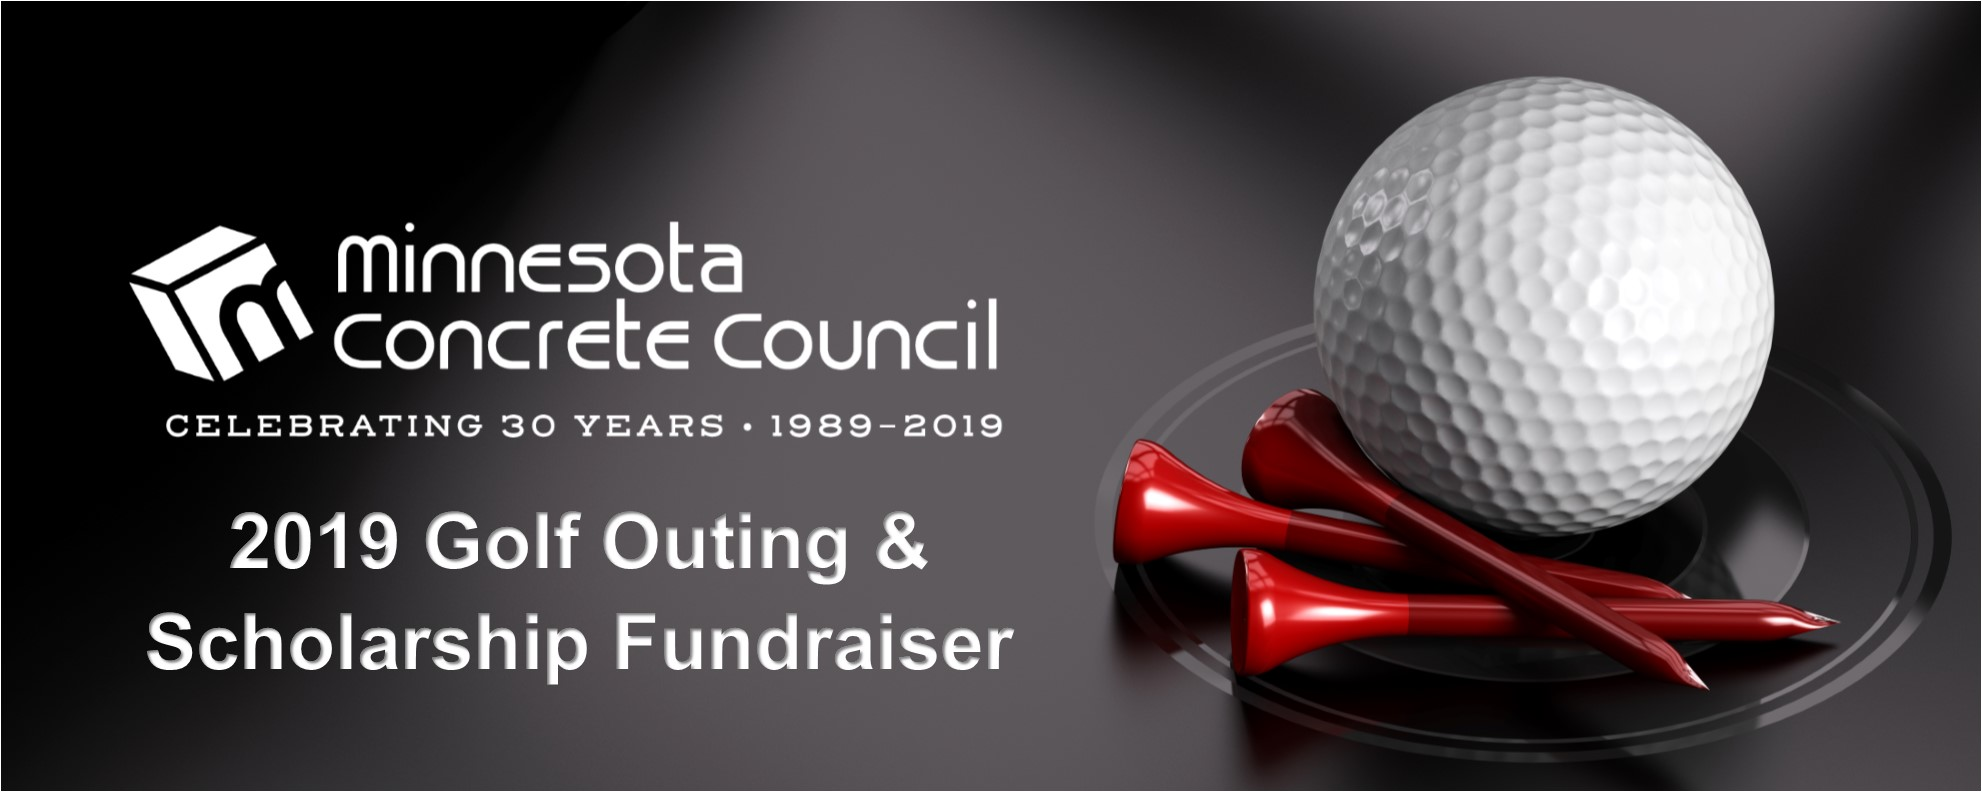 MCC 2019 Golf Outing